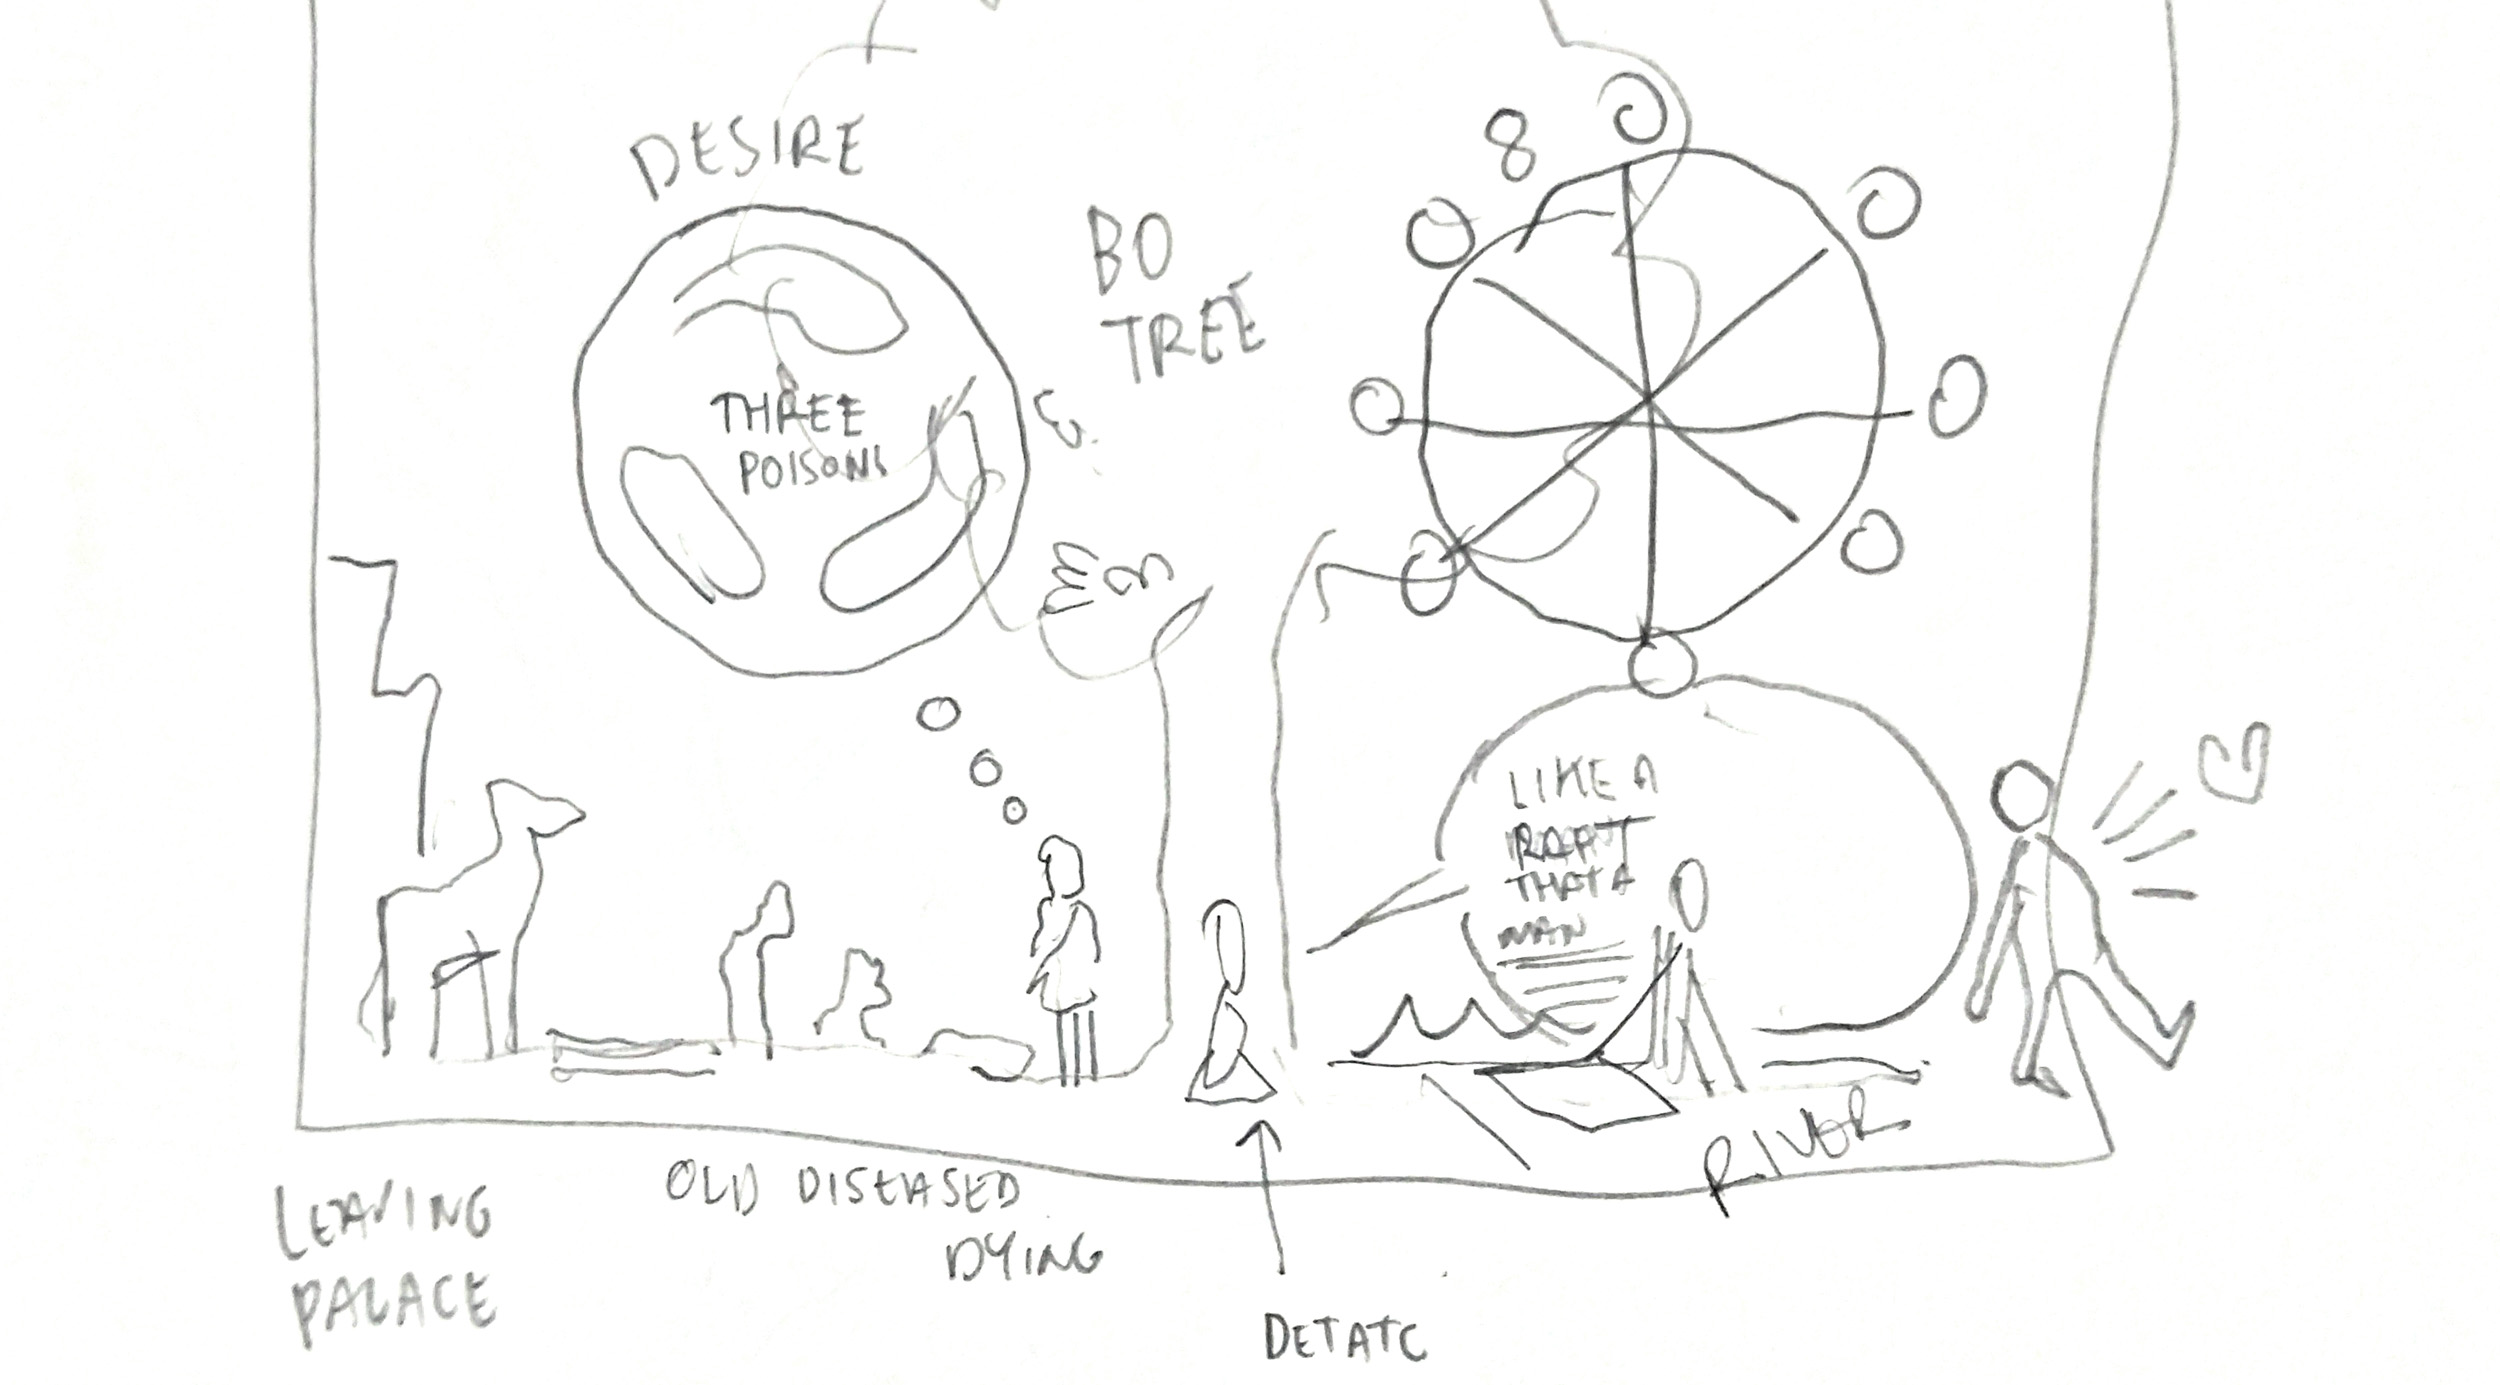 bbc-history-of-ideas-Q7-D-cognitive-01.jpg